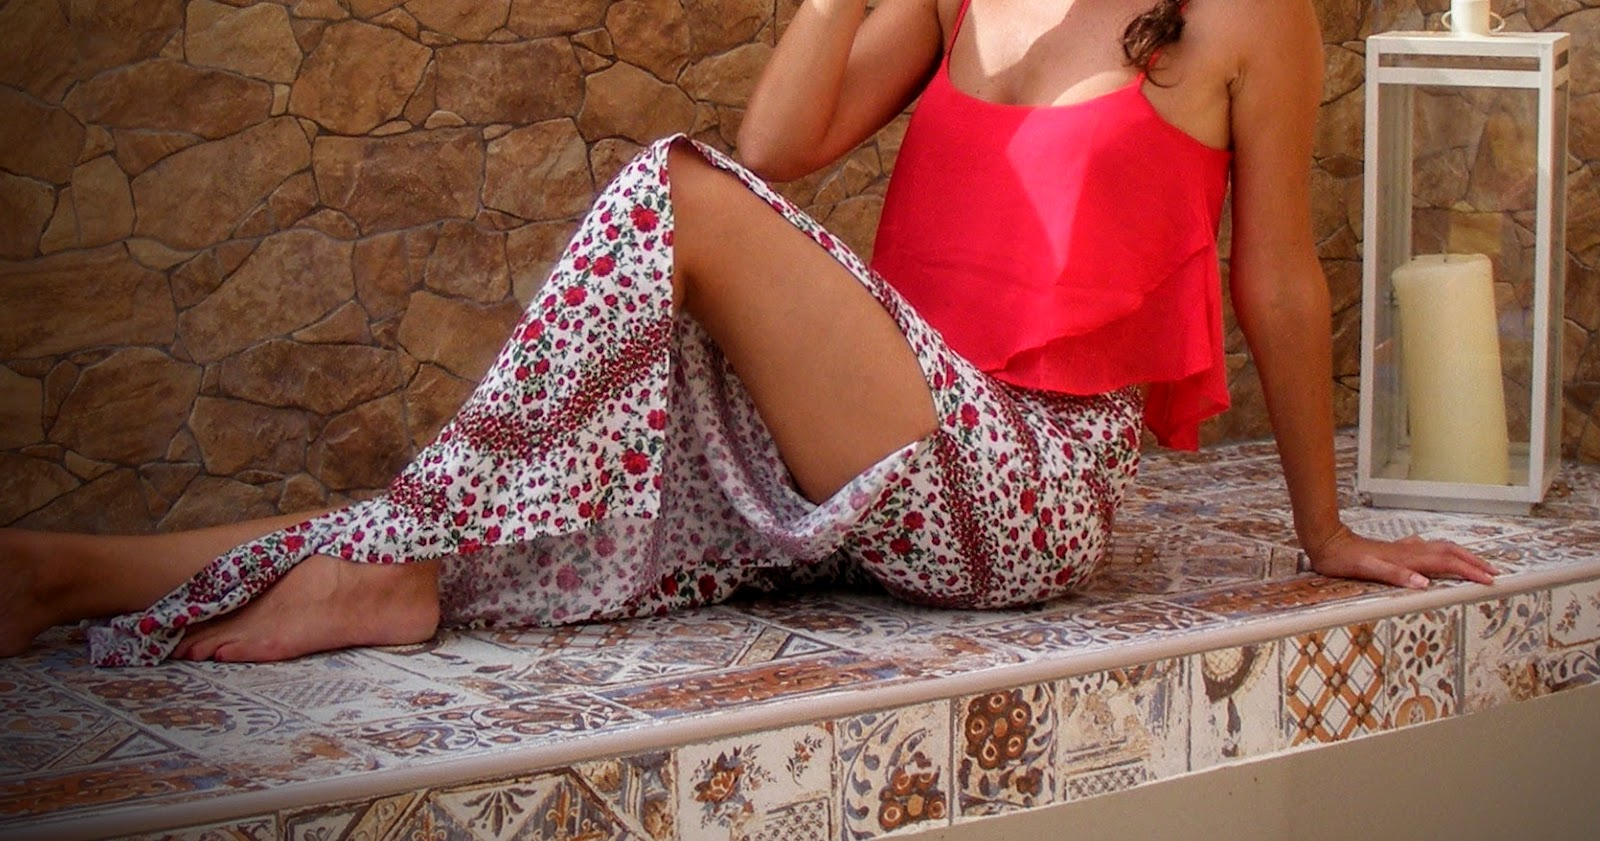 bershka, h&m, fancy, pants, pantaloni, fantasia, stampe, flower, top